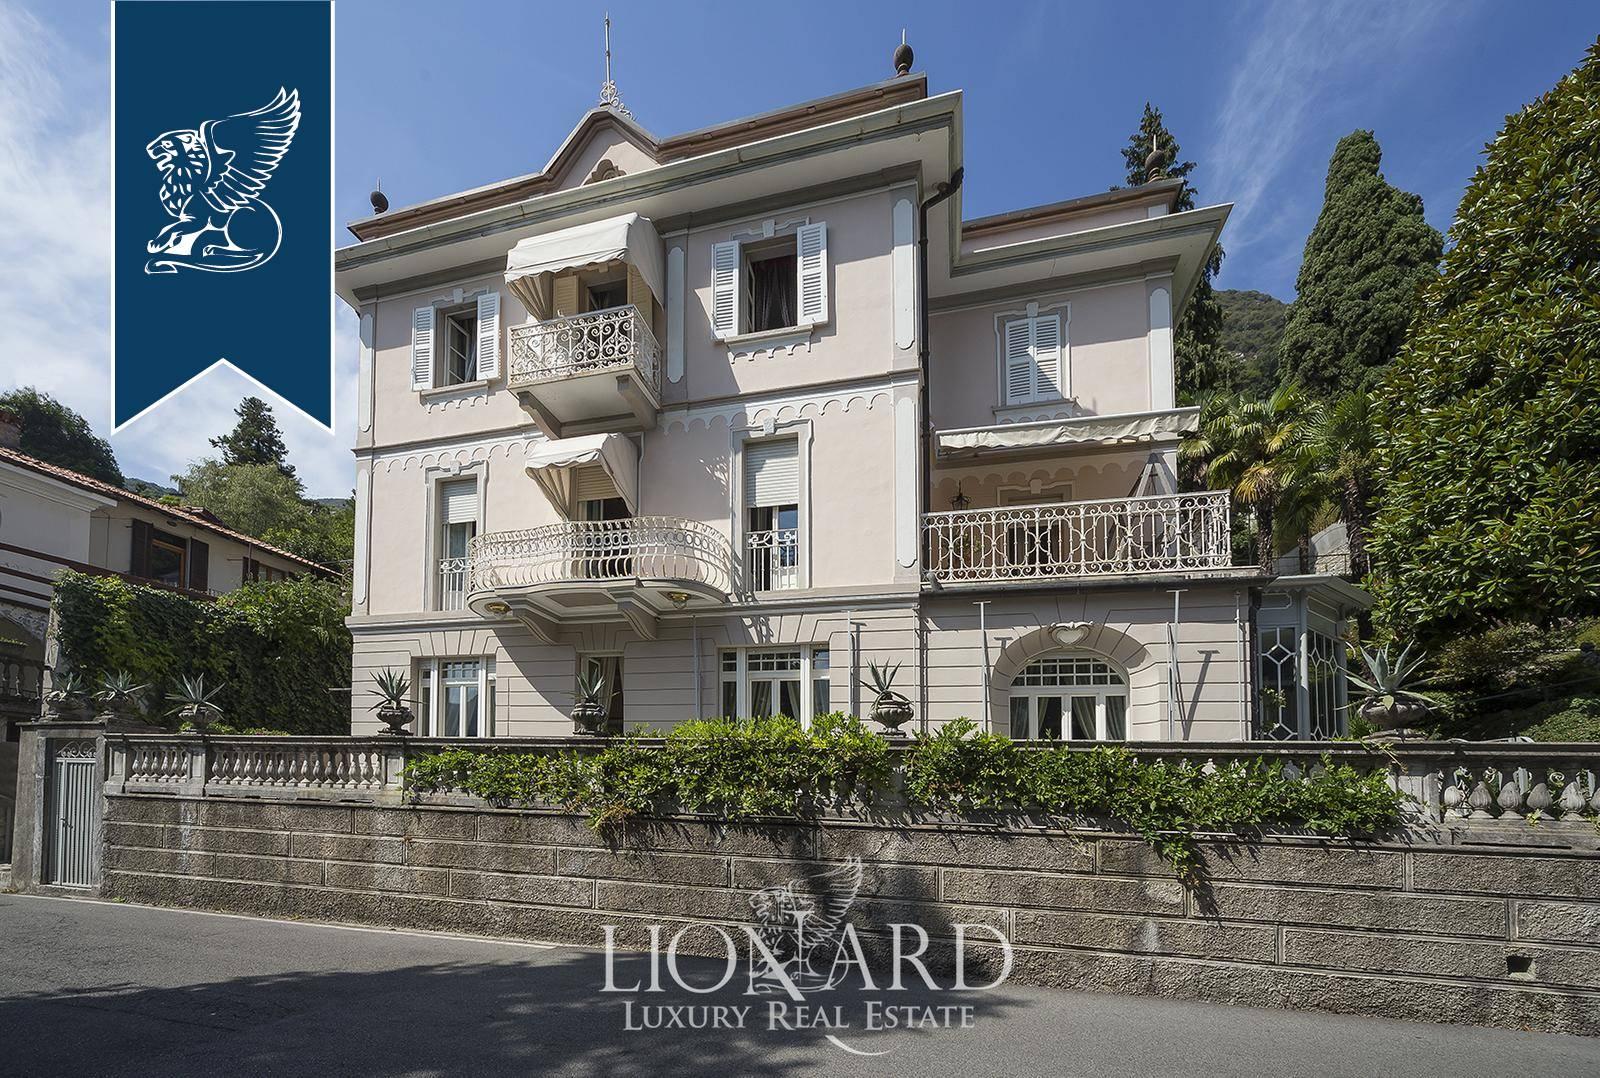 Villa in Vendita a Carate Urio: 0 locali, 457 mq - Foto 1